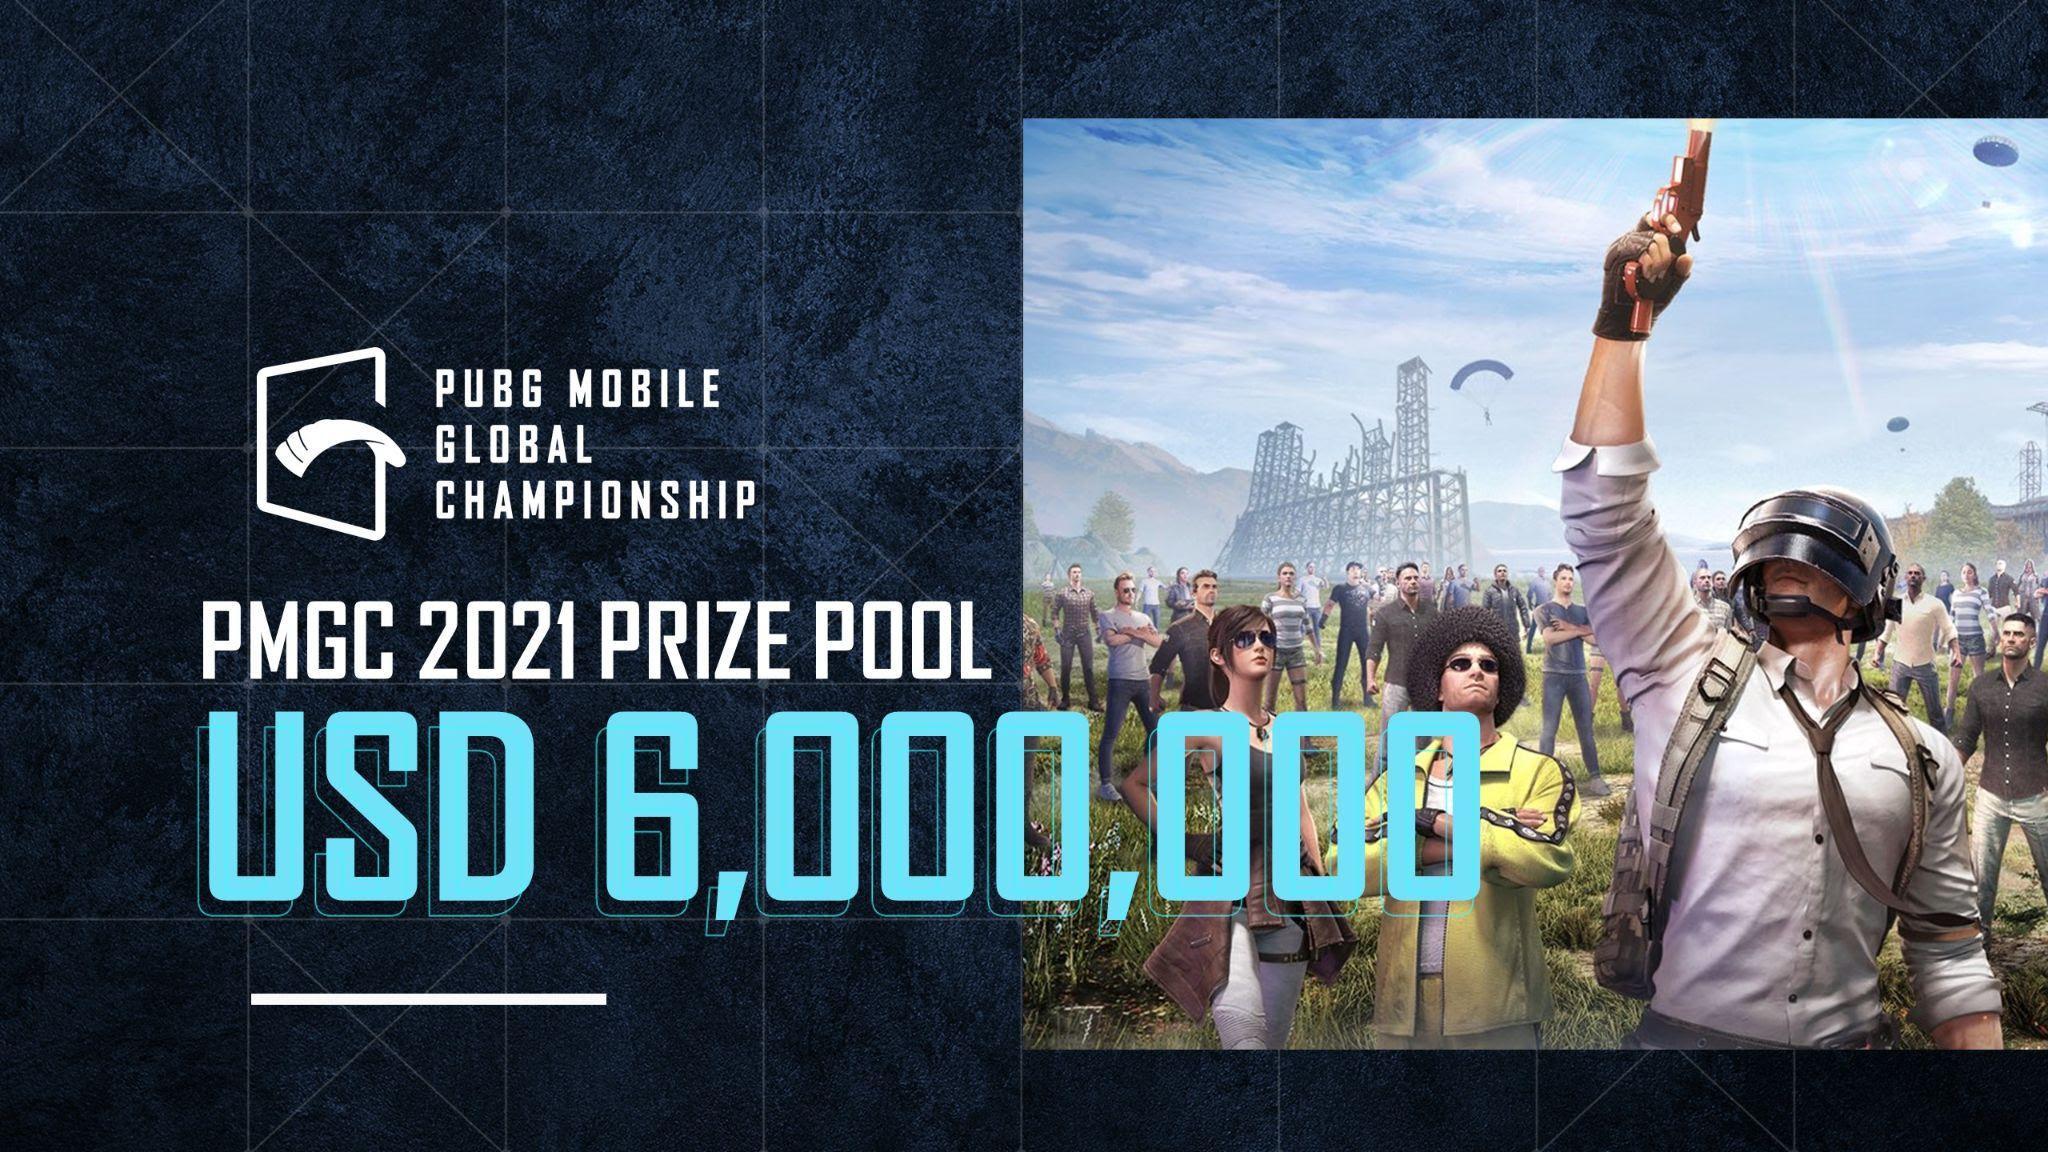 Alpha 7 vence o PUBG MOBILE World Invitational 2021 e levam US$ 350 mil para a UNICEF 4